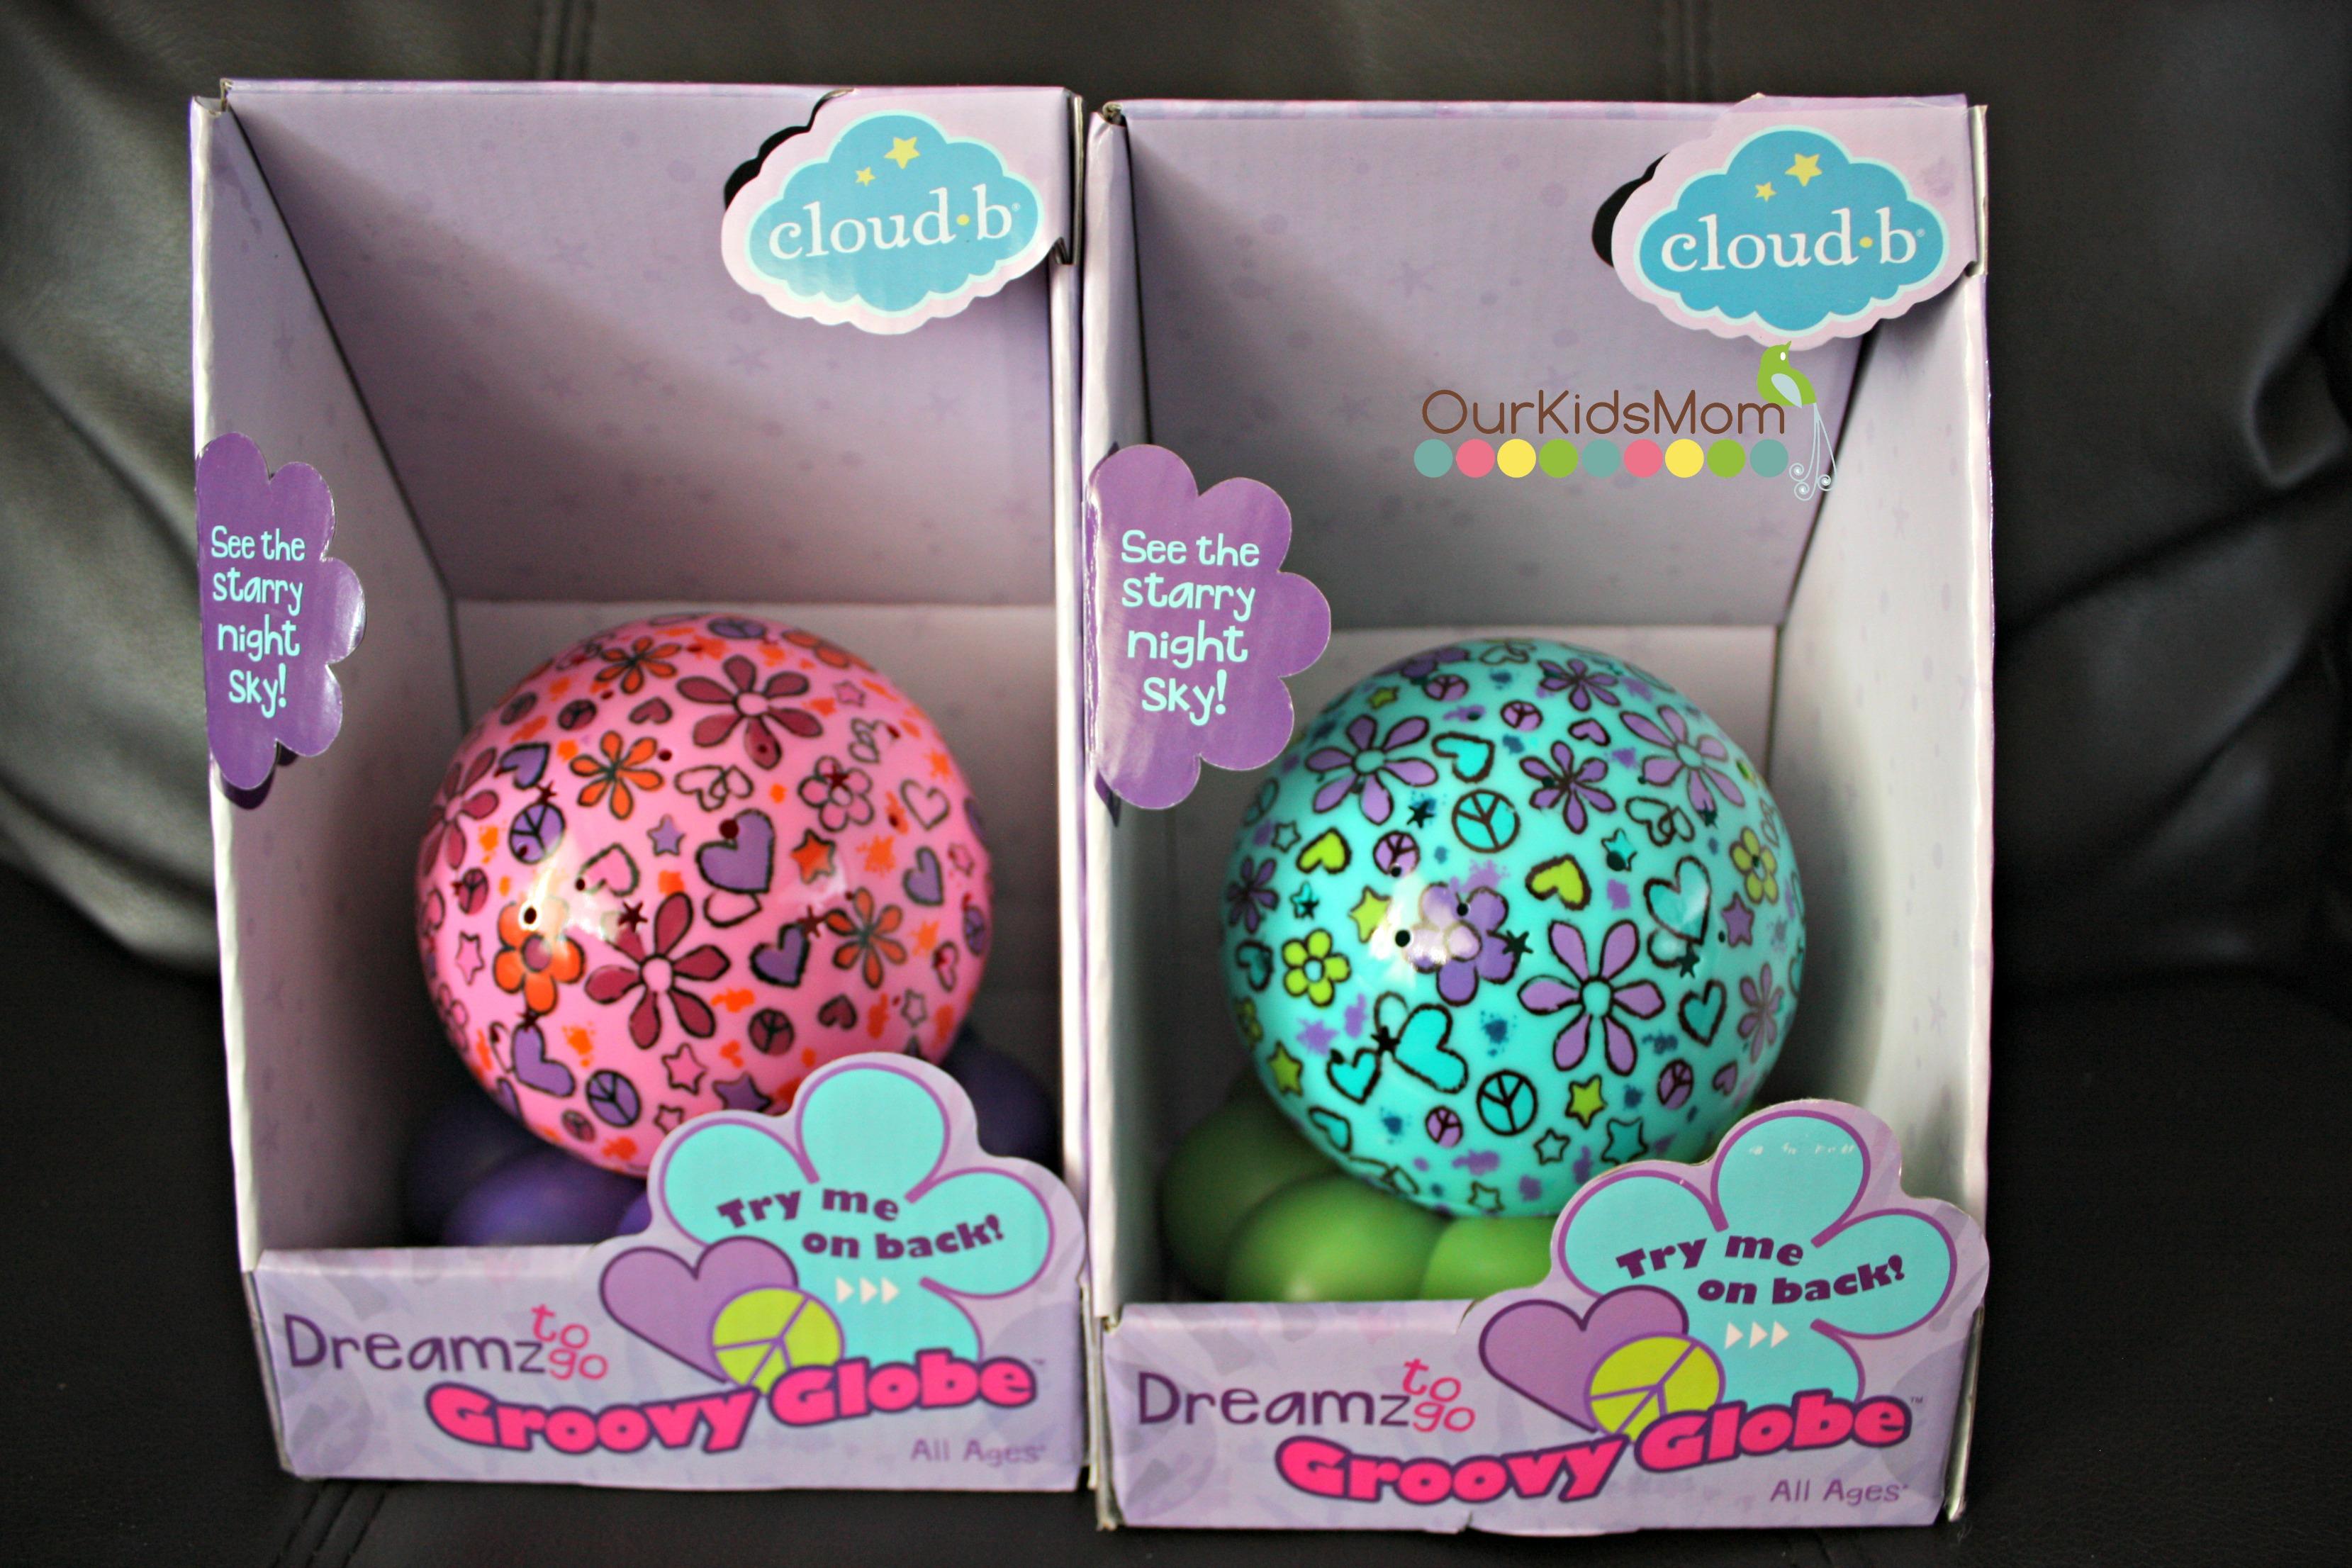 Groovy Globes